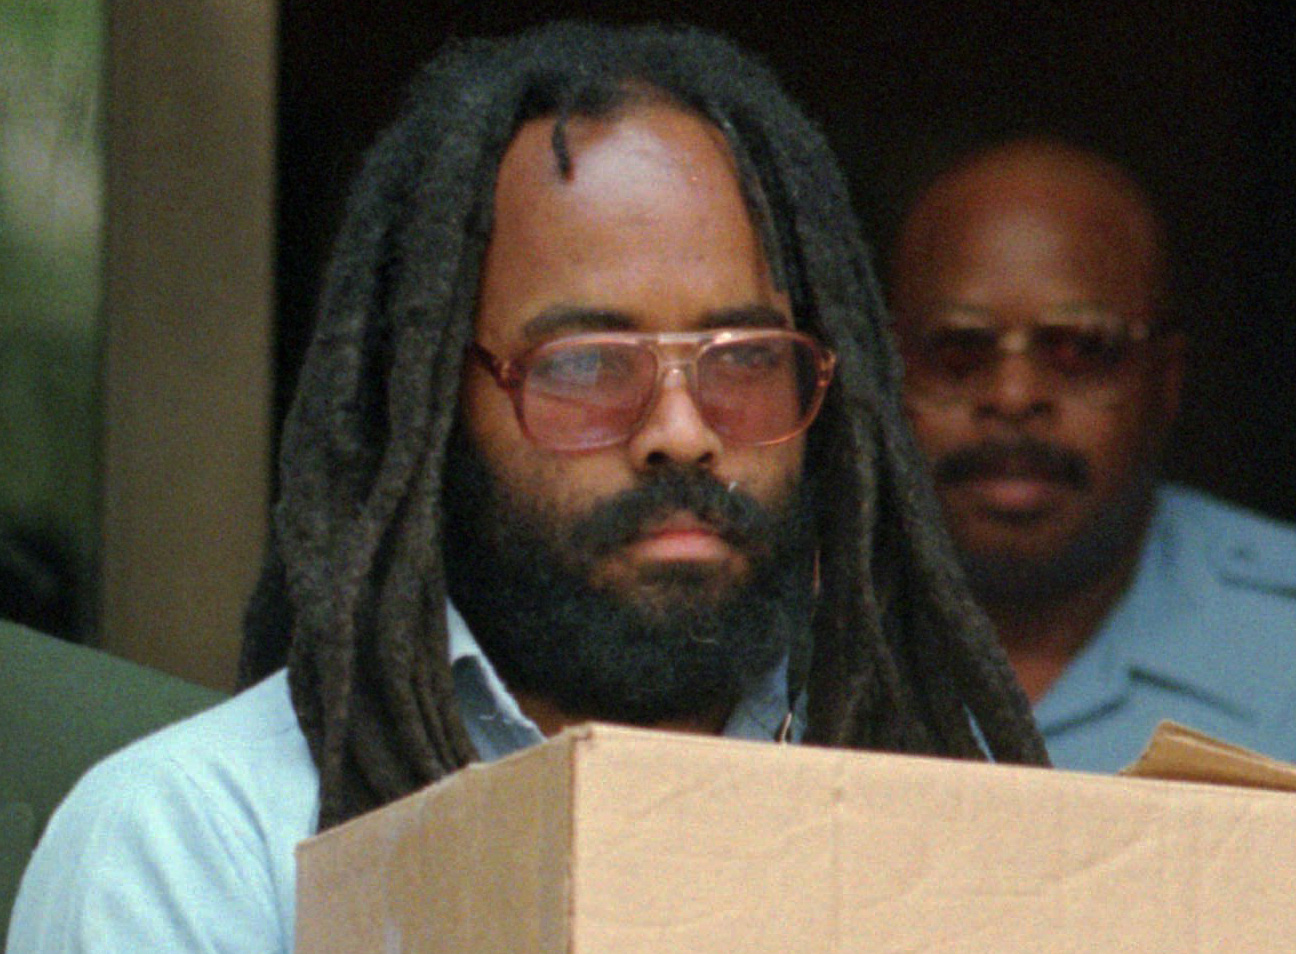 obama appoints mumia abu jamal s lawyer debo adegbile to civil obama appoints mumia abu jamal s lawyer debo adegbile to civil rights commission washington times